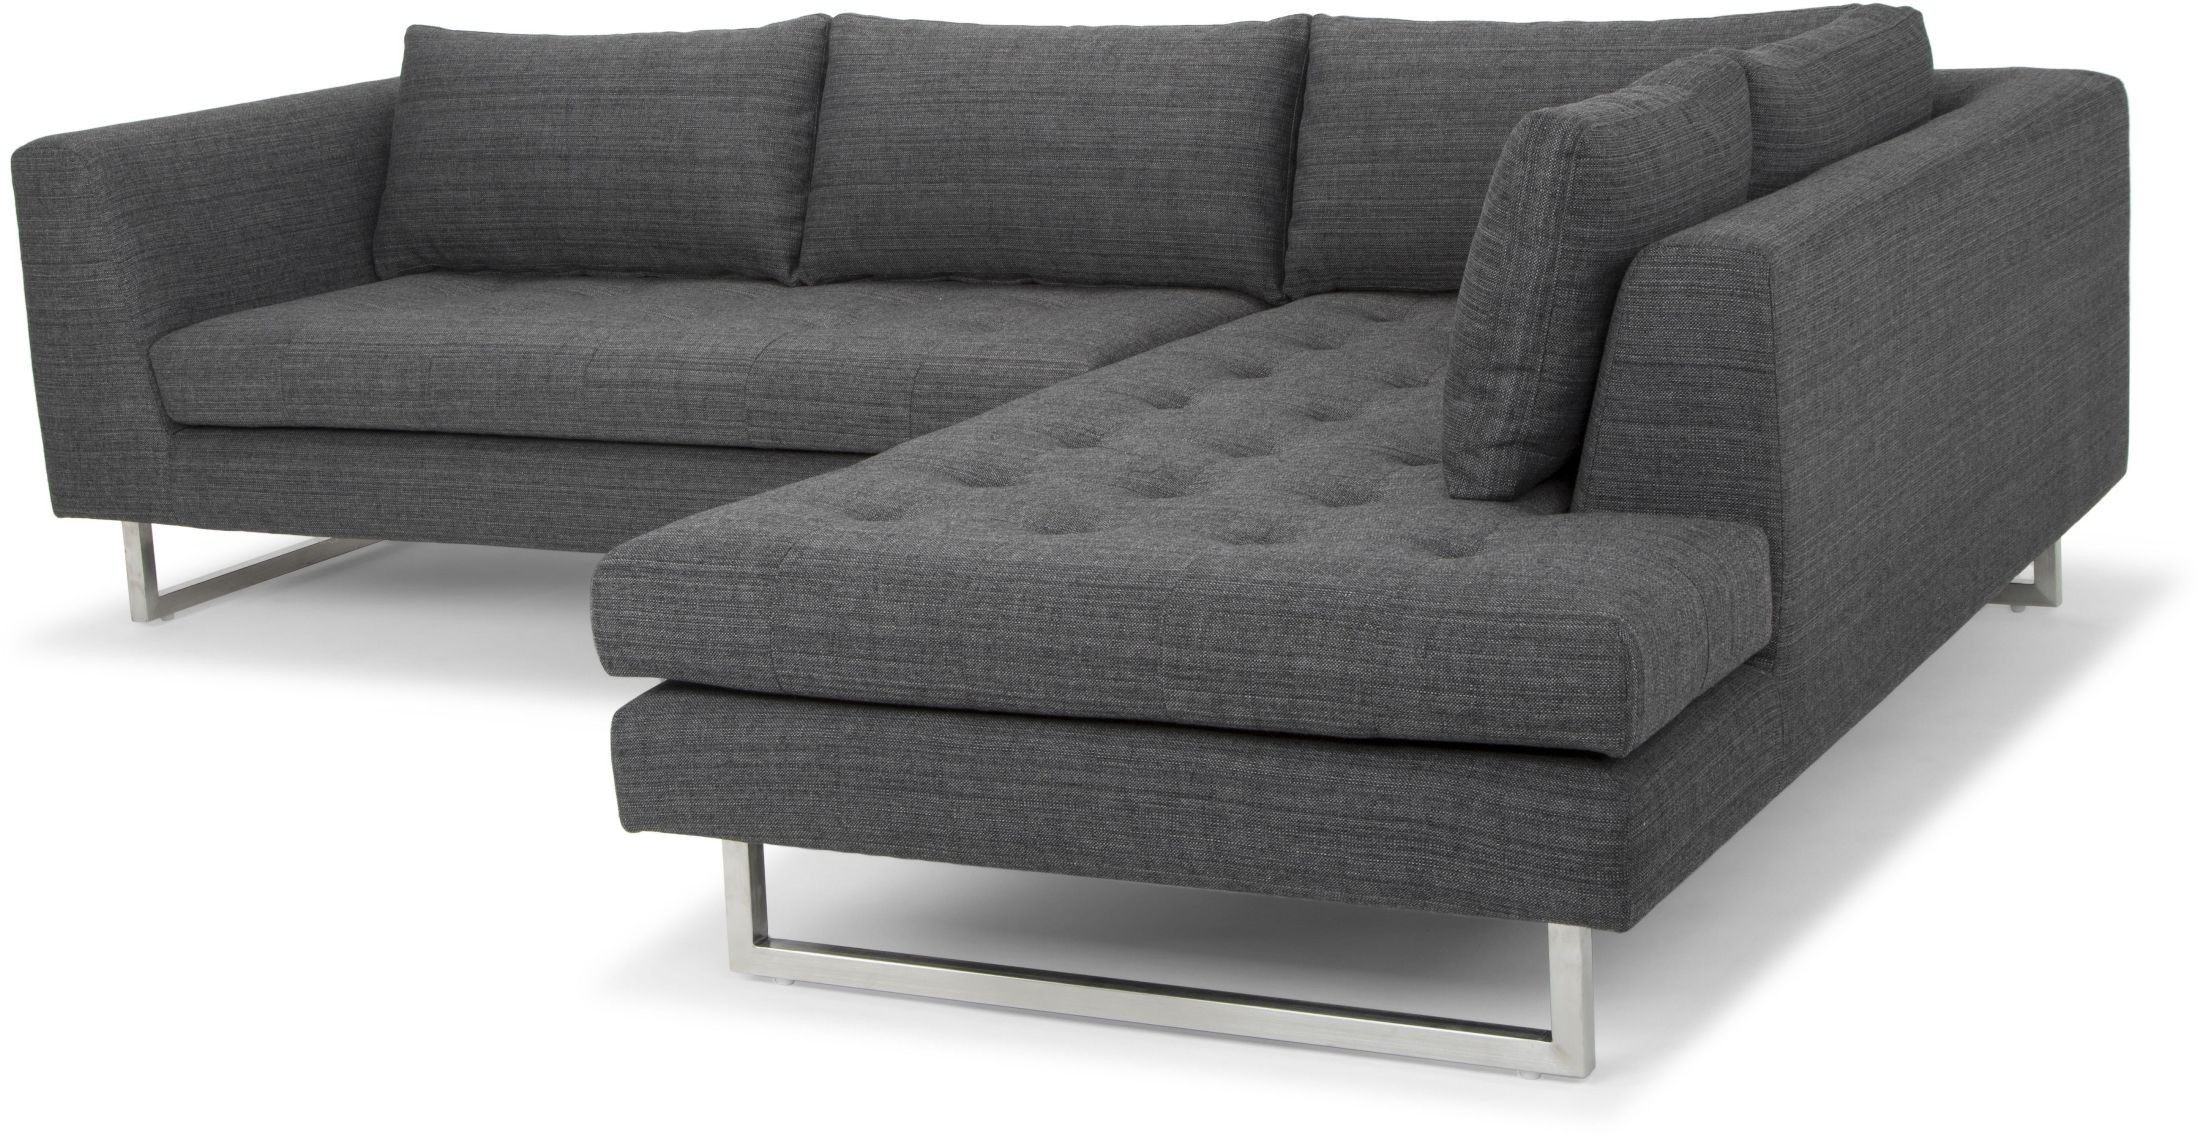 grey tweed sectional sofa calligaris sofas uk janis dark raf from nuevo